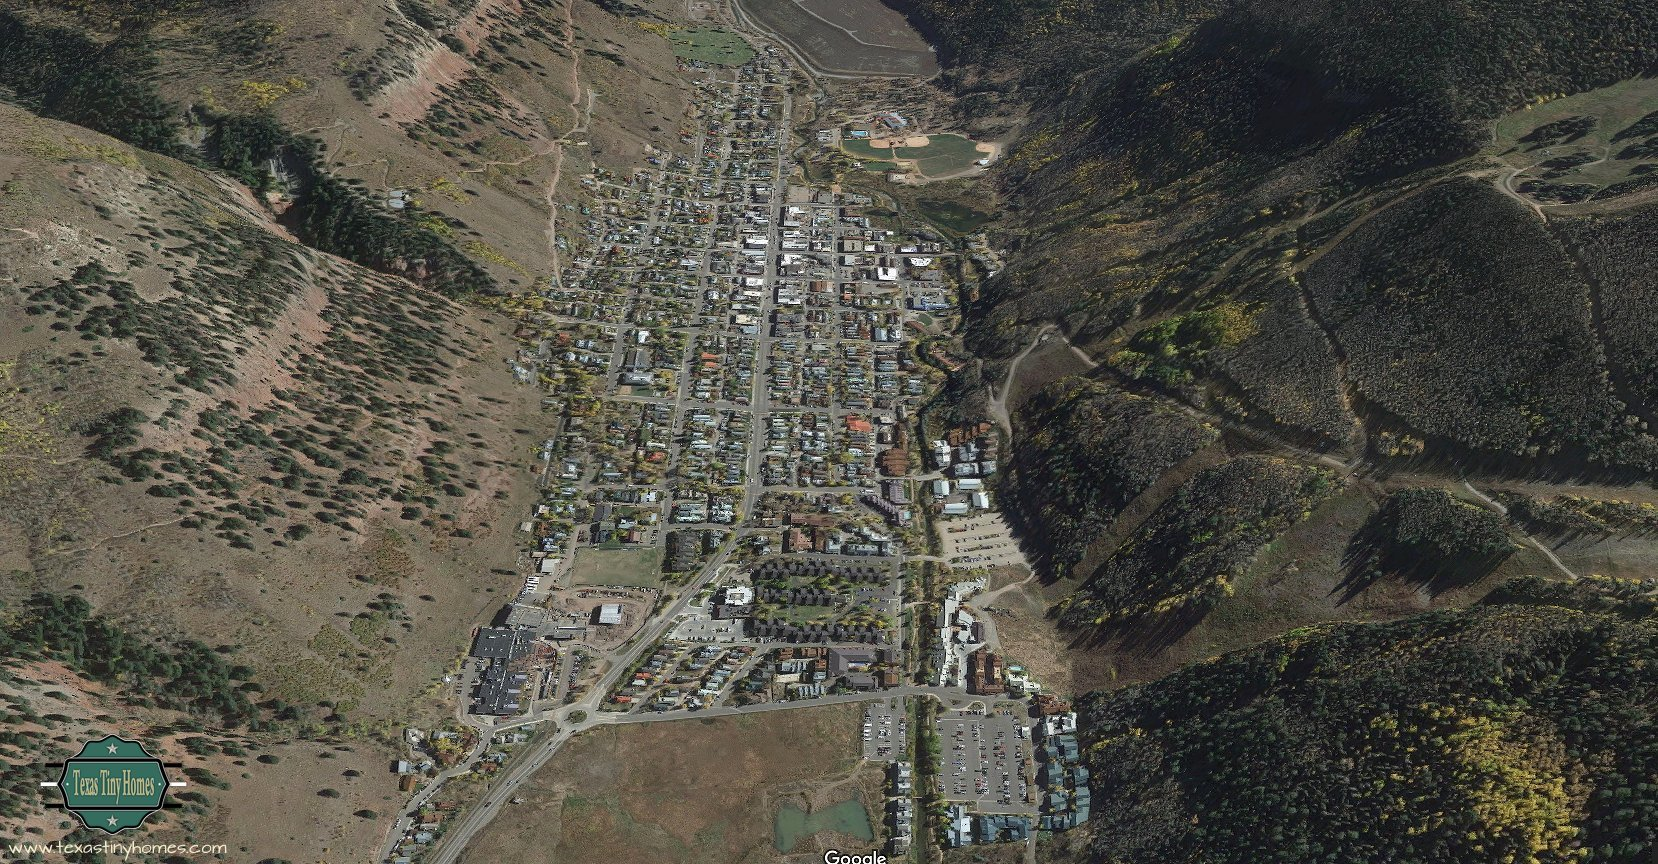 Telluride Colorado, Telluride Home Plans, Telluride Homes, Telluride Luxury Homes, Telluride Colorado Luxury Home Builder, Million Dollar Mountain Homes, Luxury Mountain Homes Telluride, Telluride Black Bear, Black Bear Pass